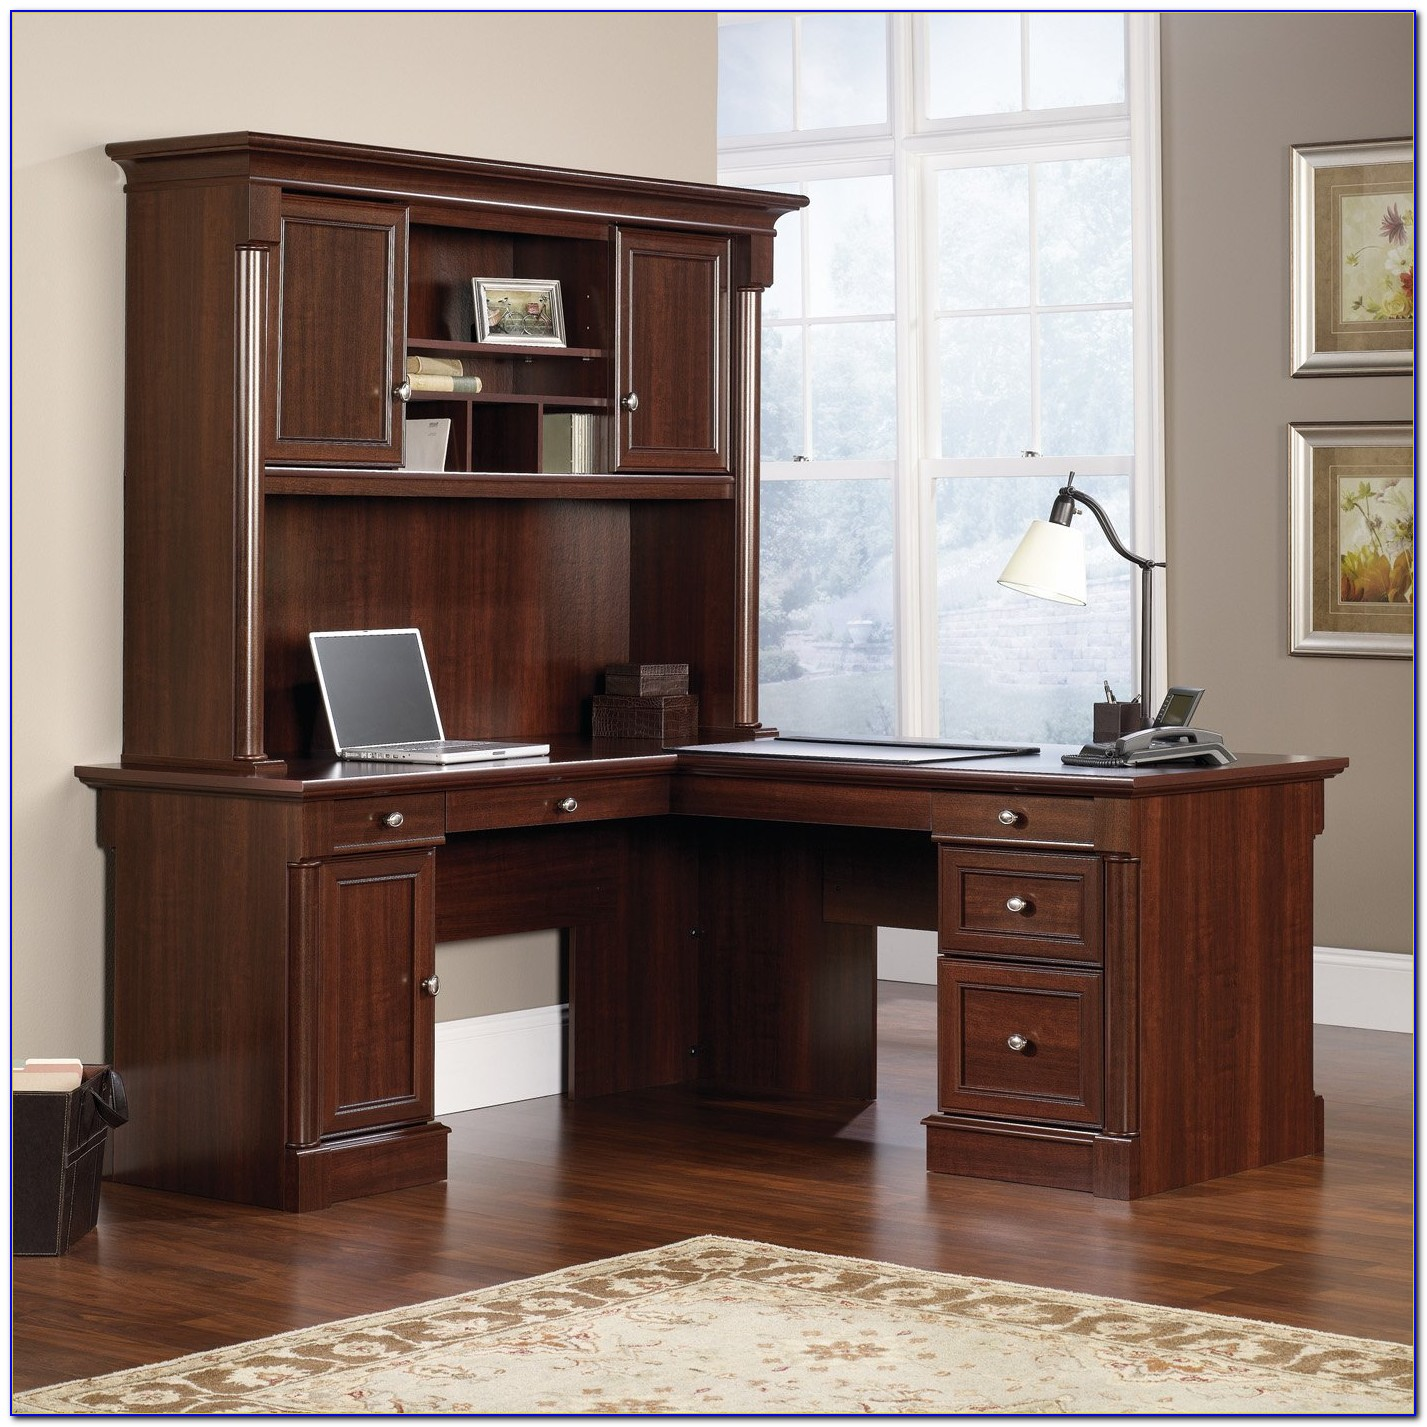 Sauder White Desk With Hutch